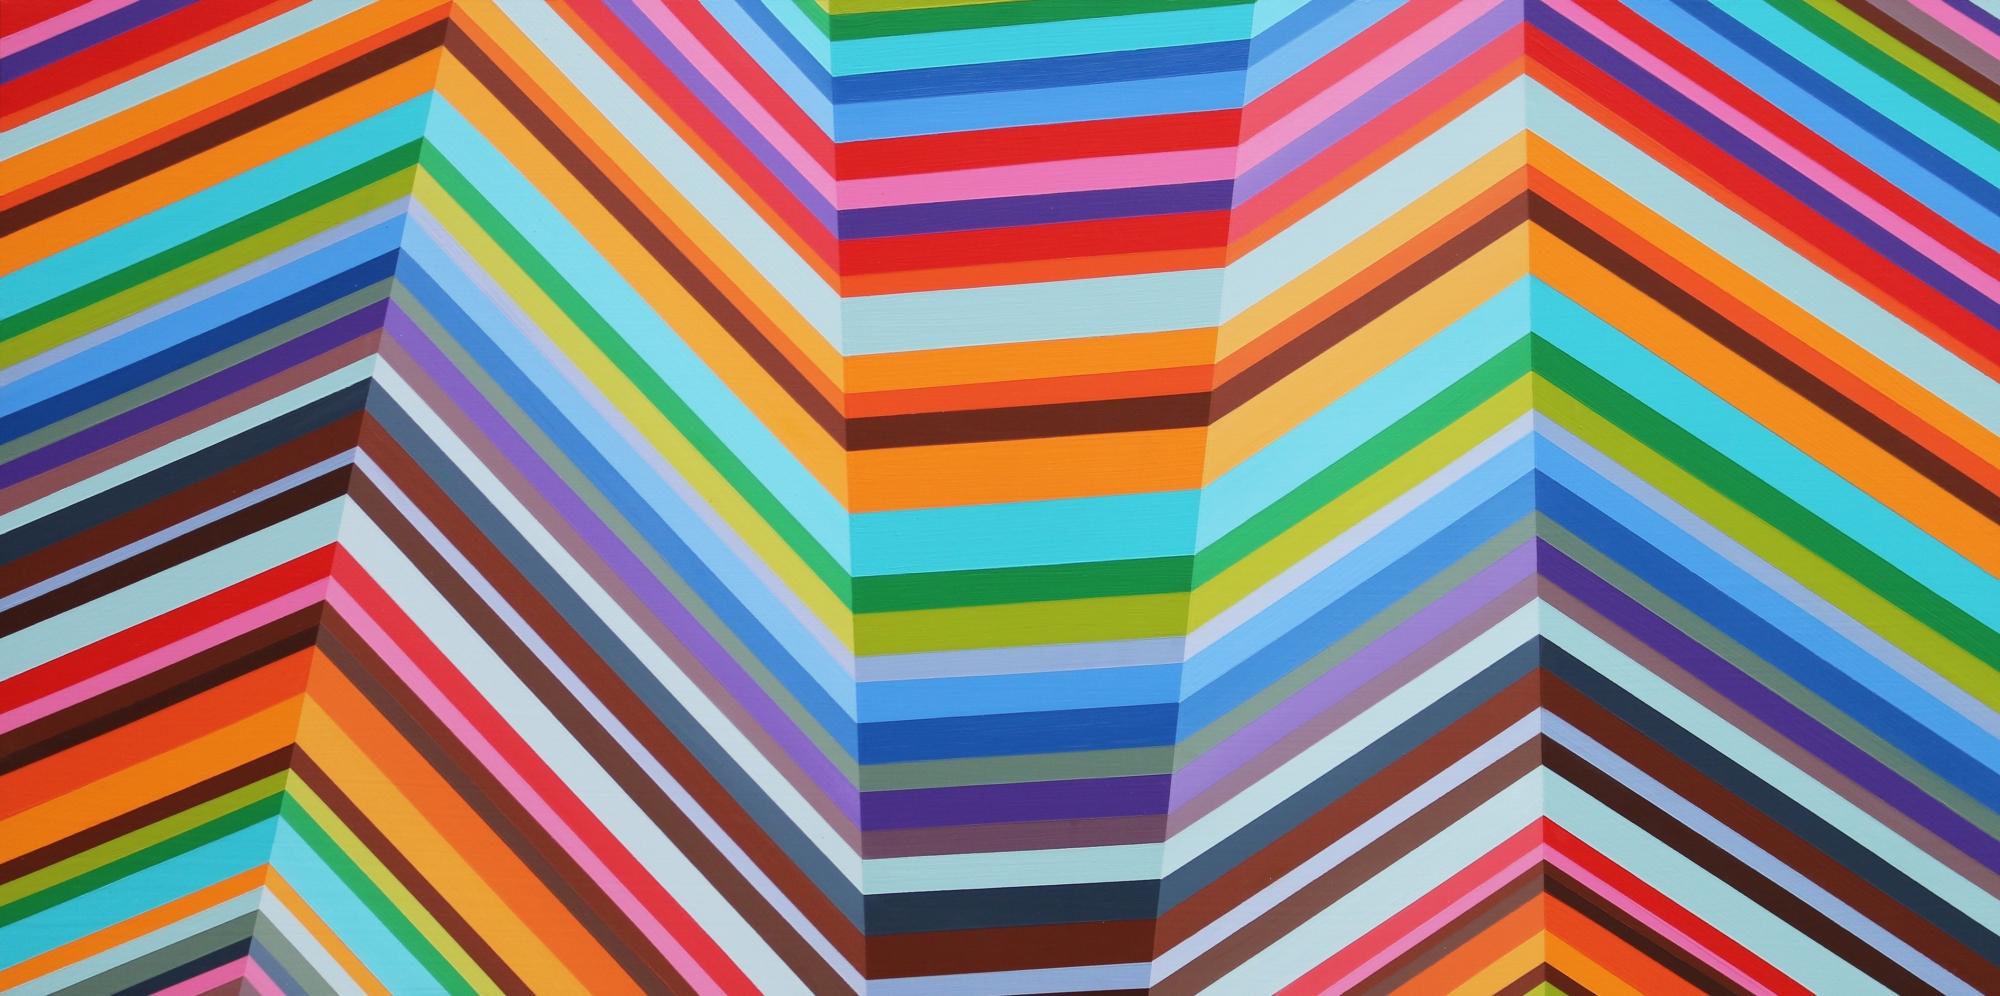 Strat Folds by Kristofir  Dean